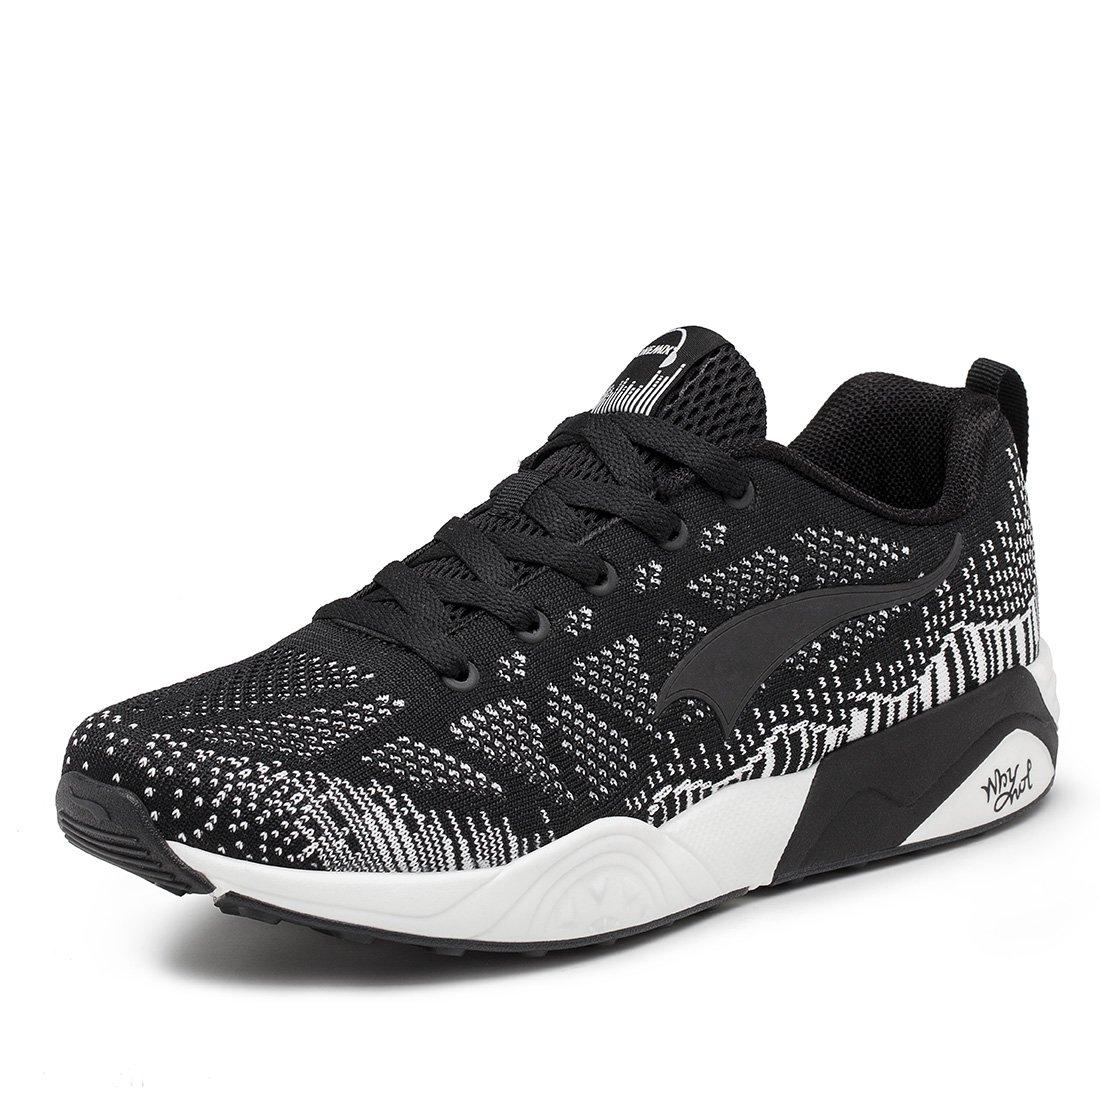 ONEMIX Men\'s Knit Pattern Sports Running Shoes Lightweight Women\'s Fashion Mesh Sneakers